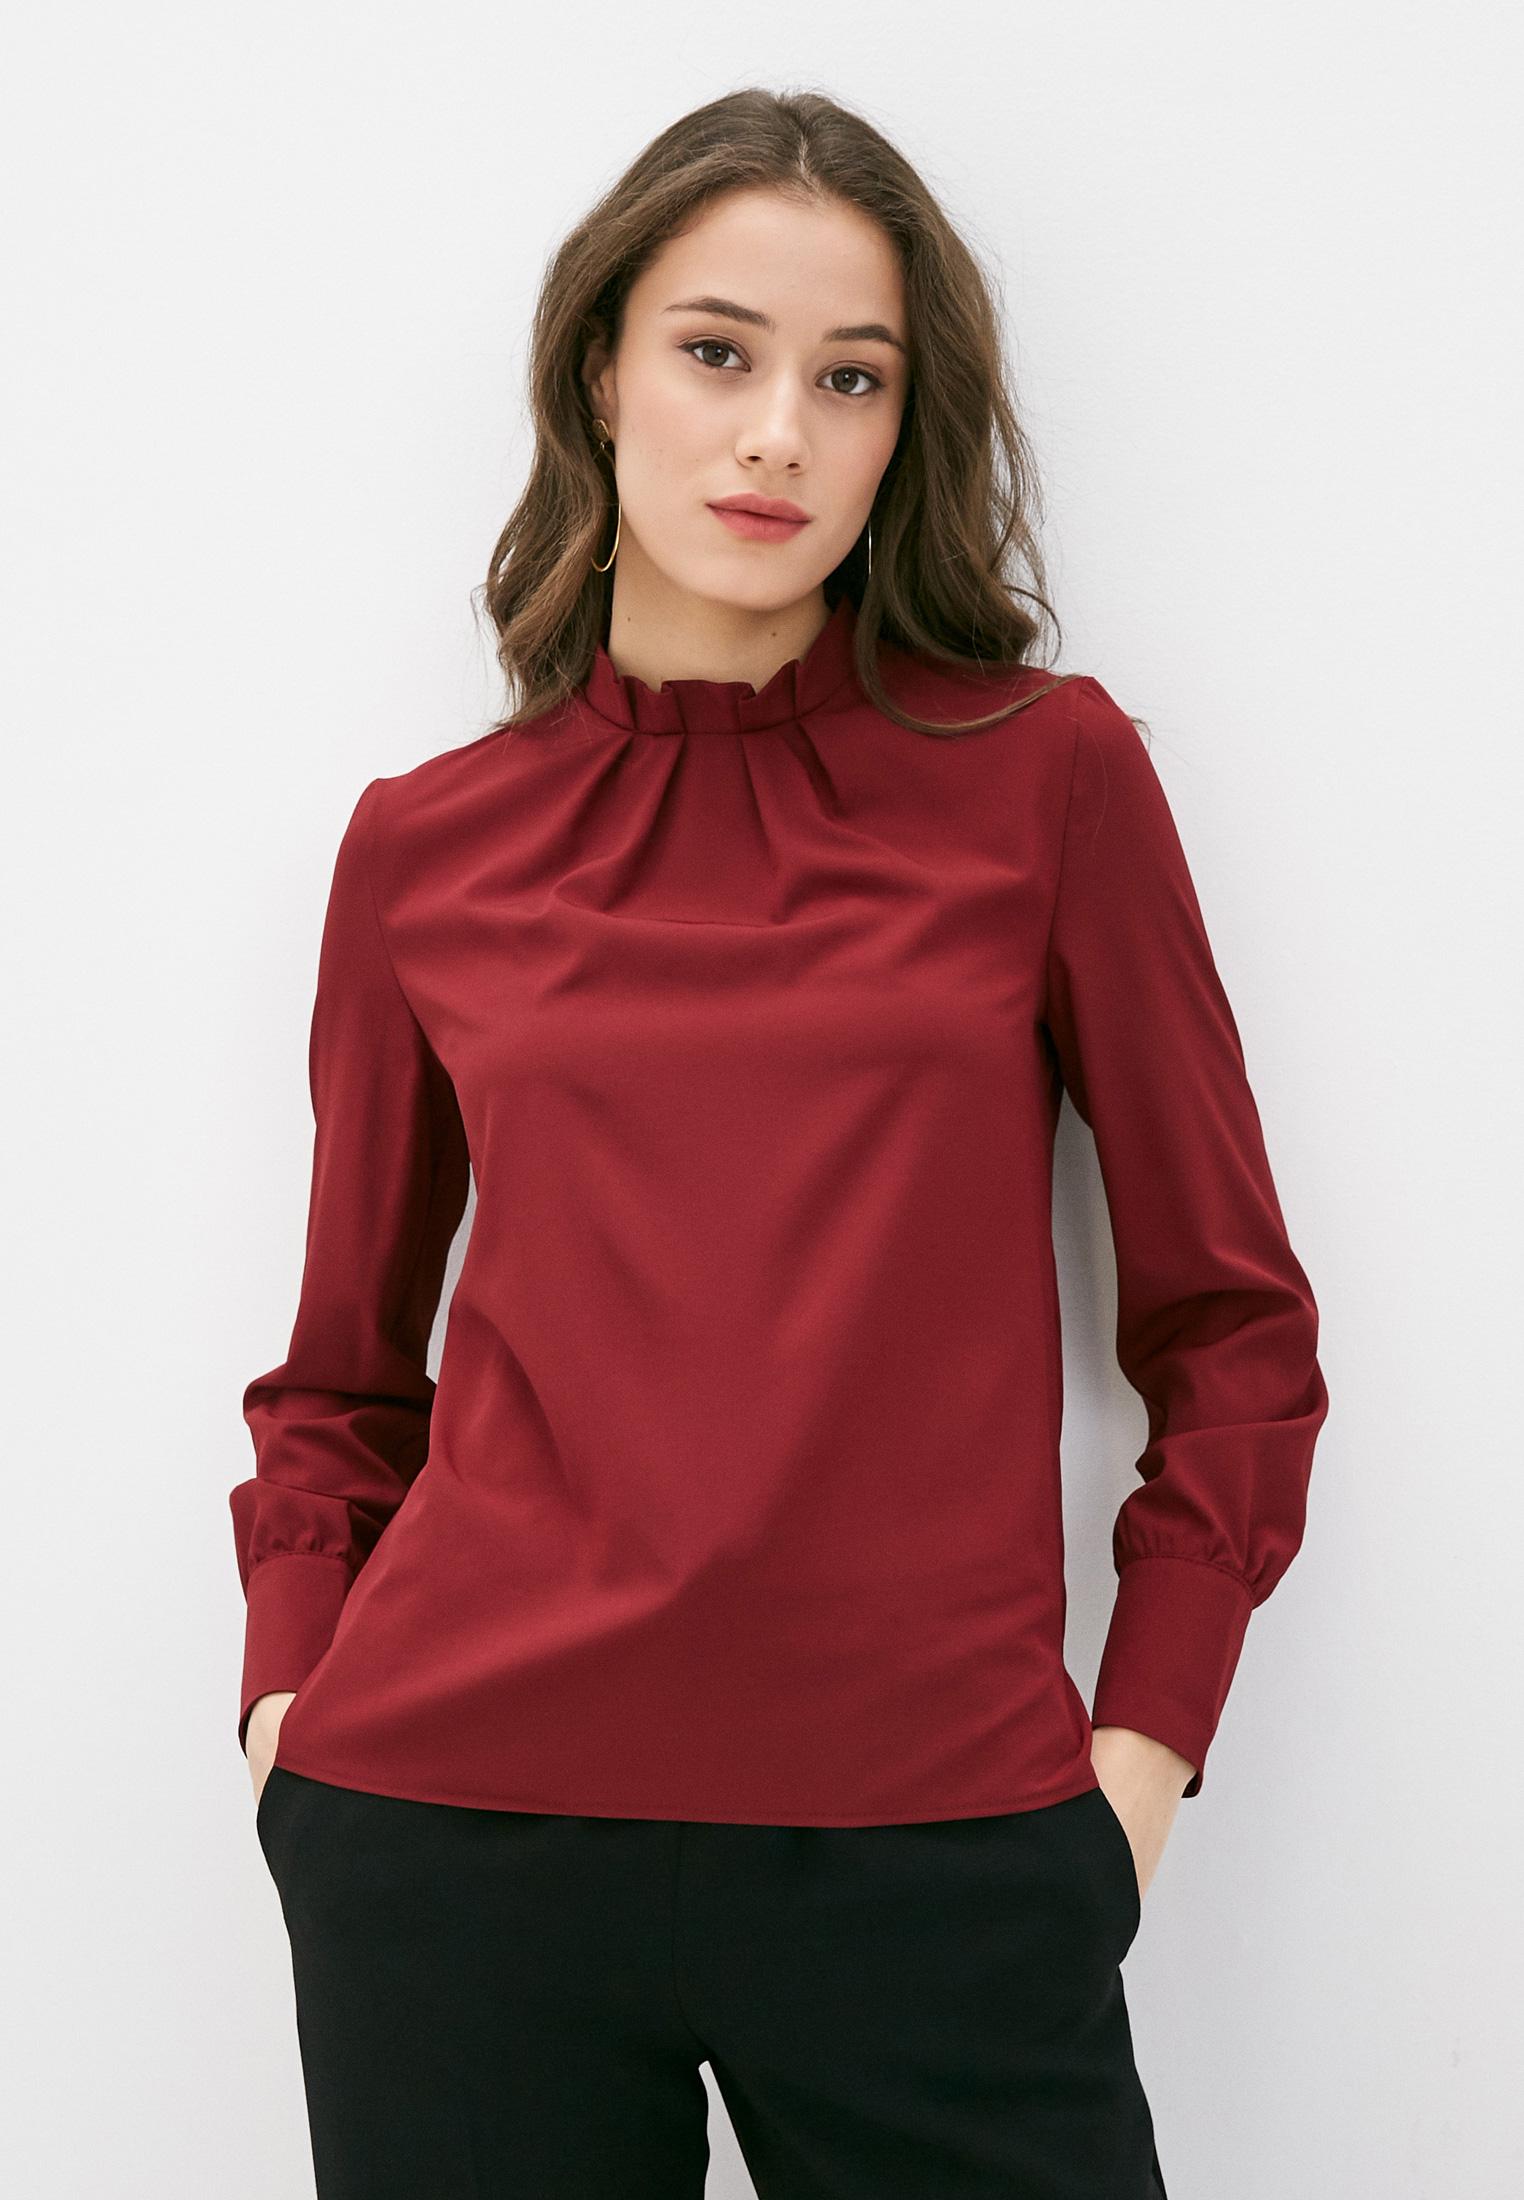 Блуза AM One купить за в интернет-магазине Lamoda.ru